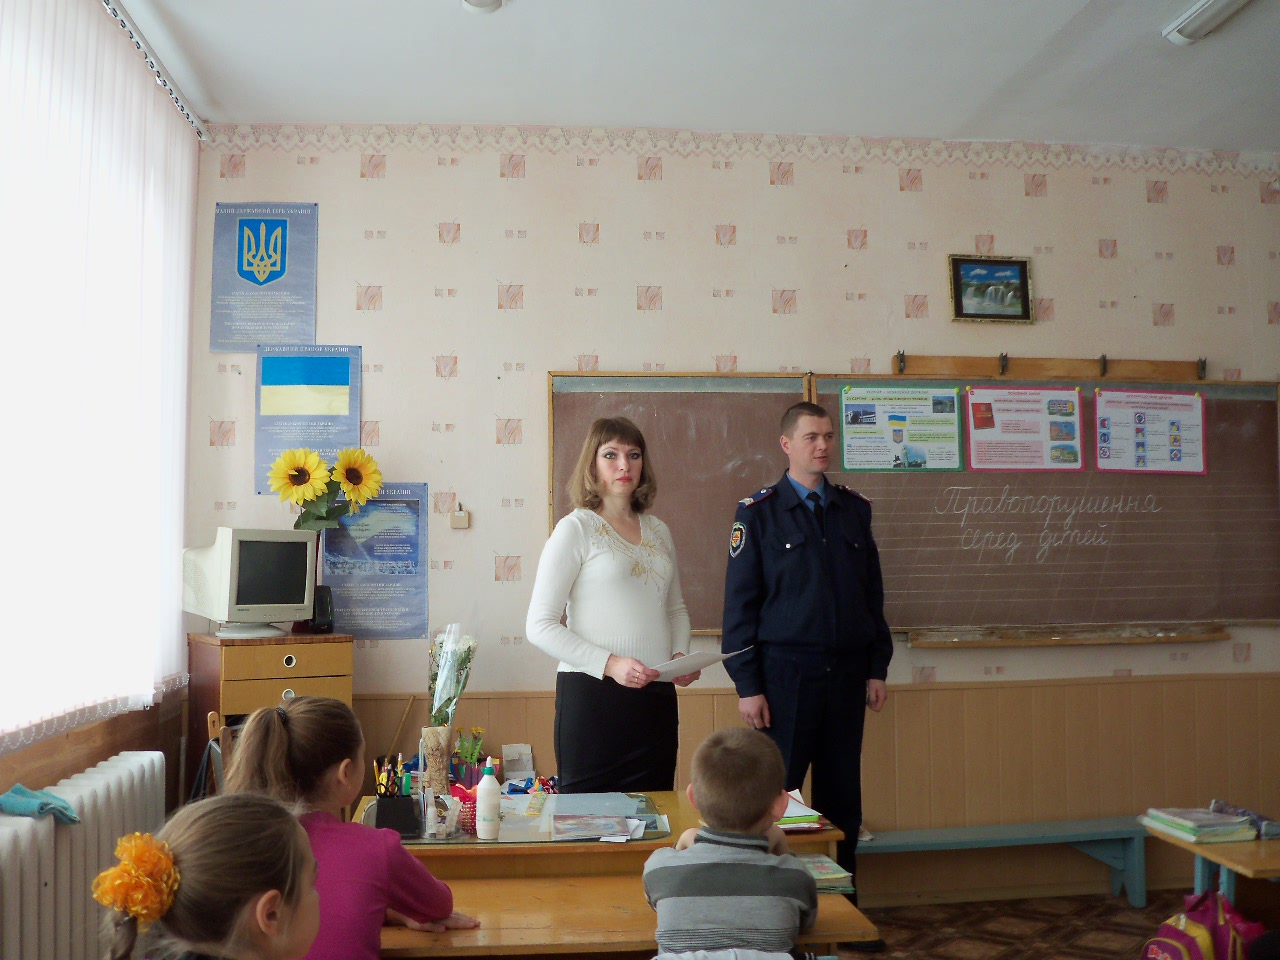 http://karl-gymnasium.at.ua/class_visti/7896781.jpg